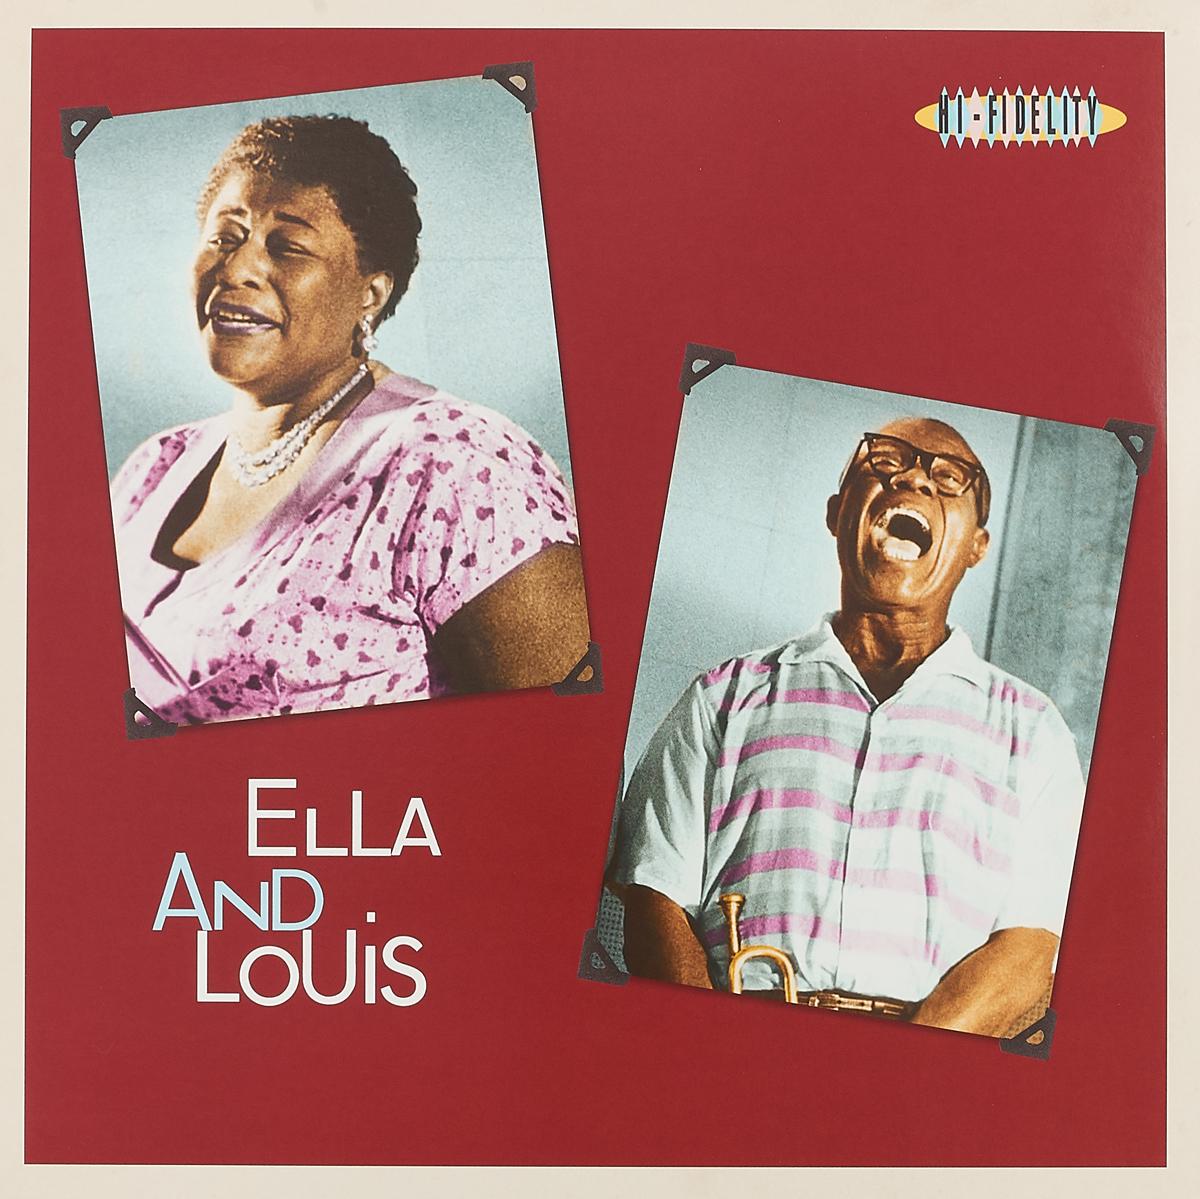 Элла Фитцжеральд,Луи Армстронг Ella Fitzgerald And Louis Armstrong. Ella & Louis (LP) ella fitzgerald louis armstrong ella fitzgerald louis armstrong ella louis